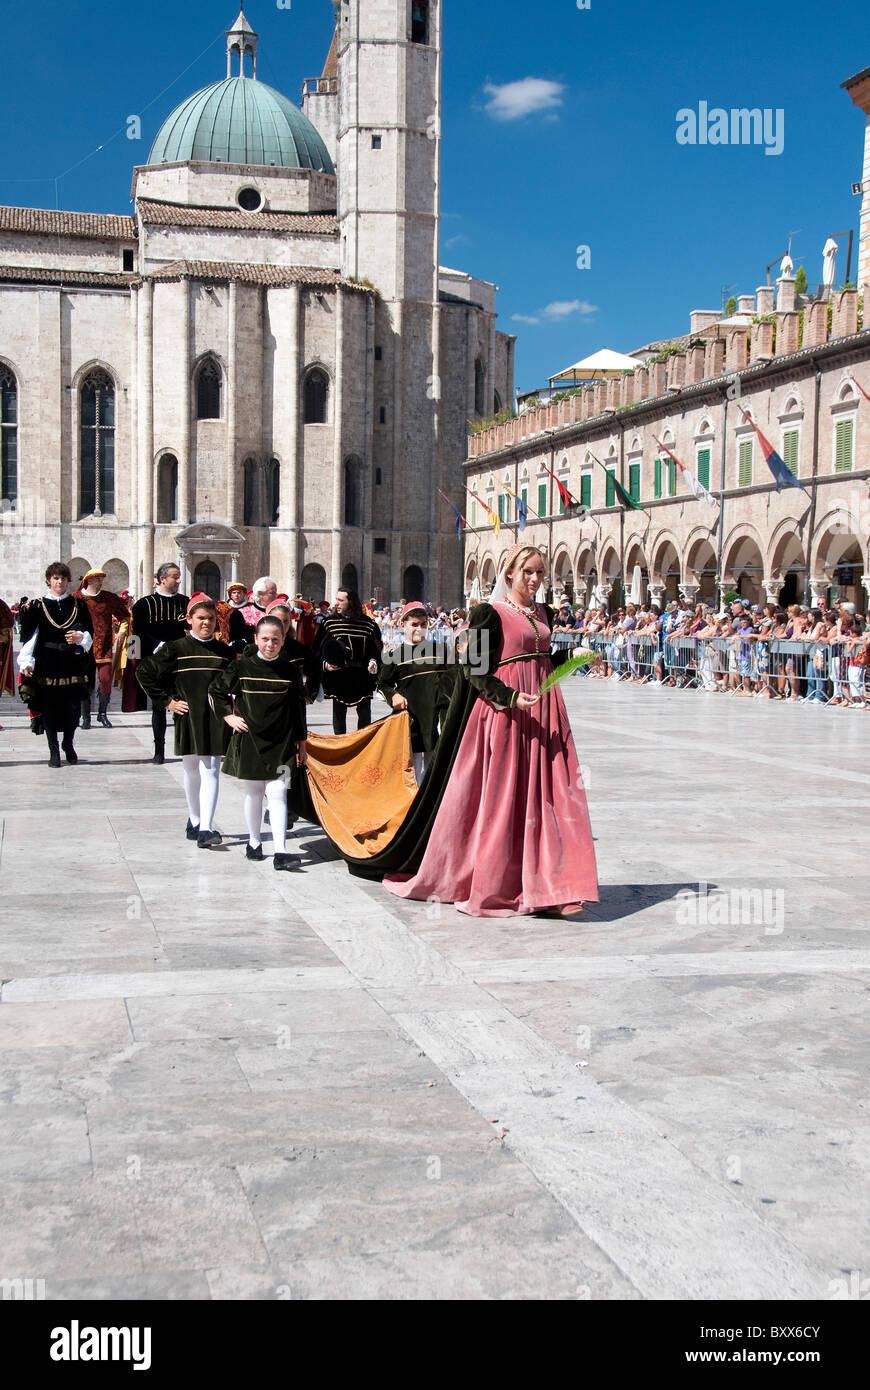 Ladies of the court parade in the festival of the Quintana in Piazza del Popolo, Ascoli Piceno, Le Marches - Stock Image